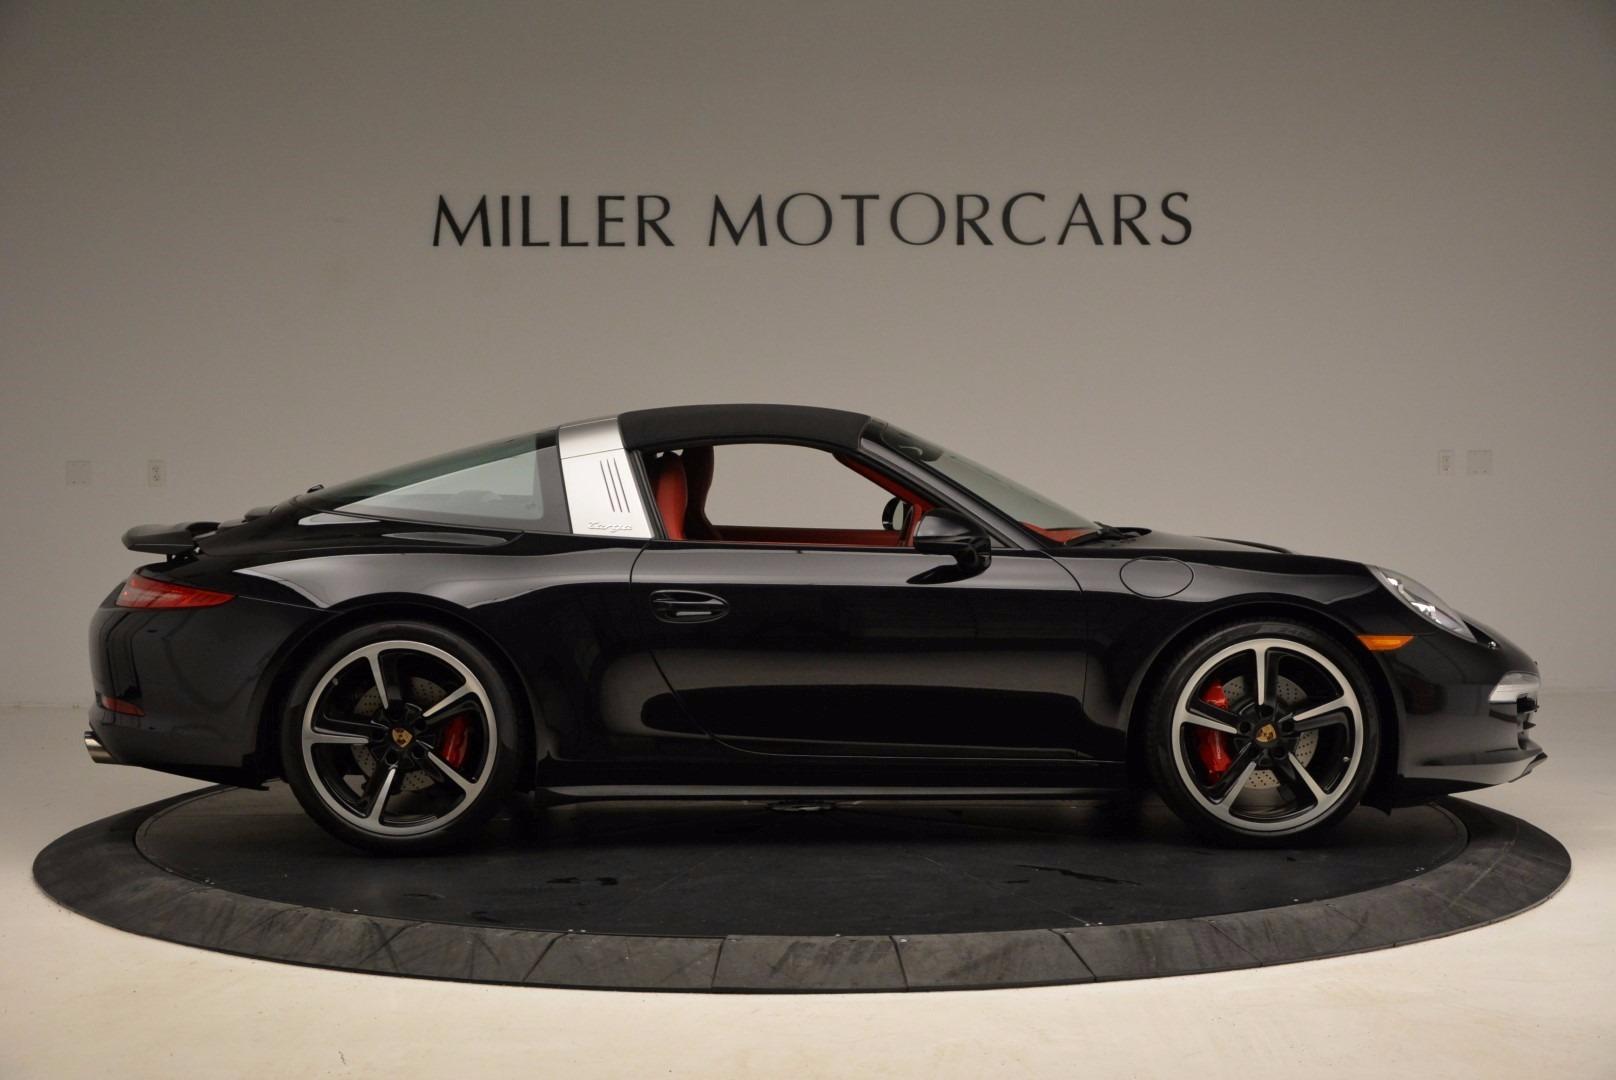 Used 2015 Porsche 911 Targa 4S For Sale In Greenwich, CT 1476_p18